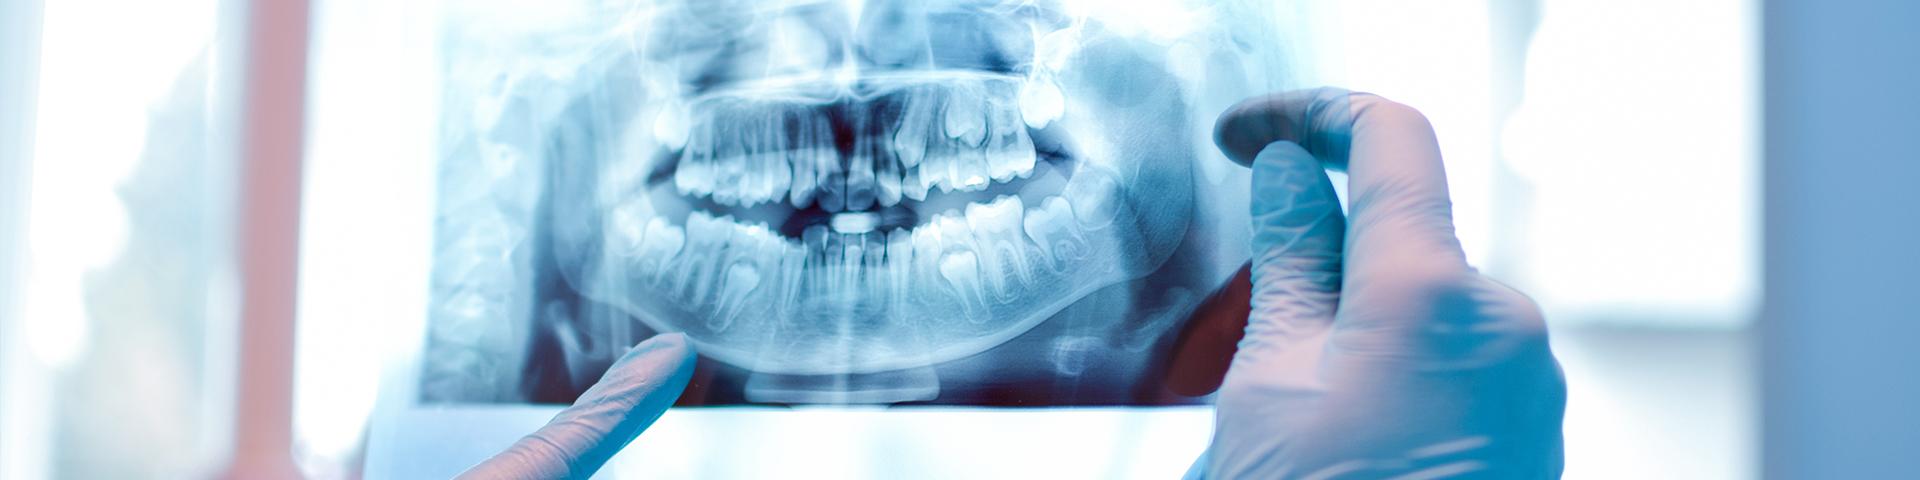 Röntgenaufnahme Gebiss